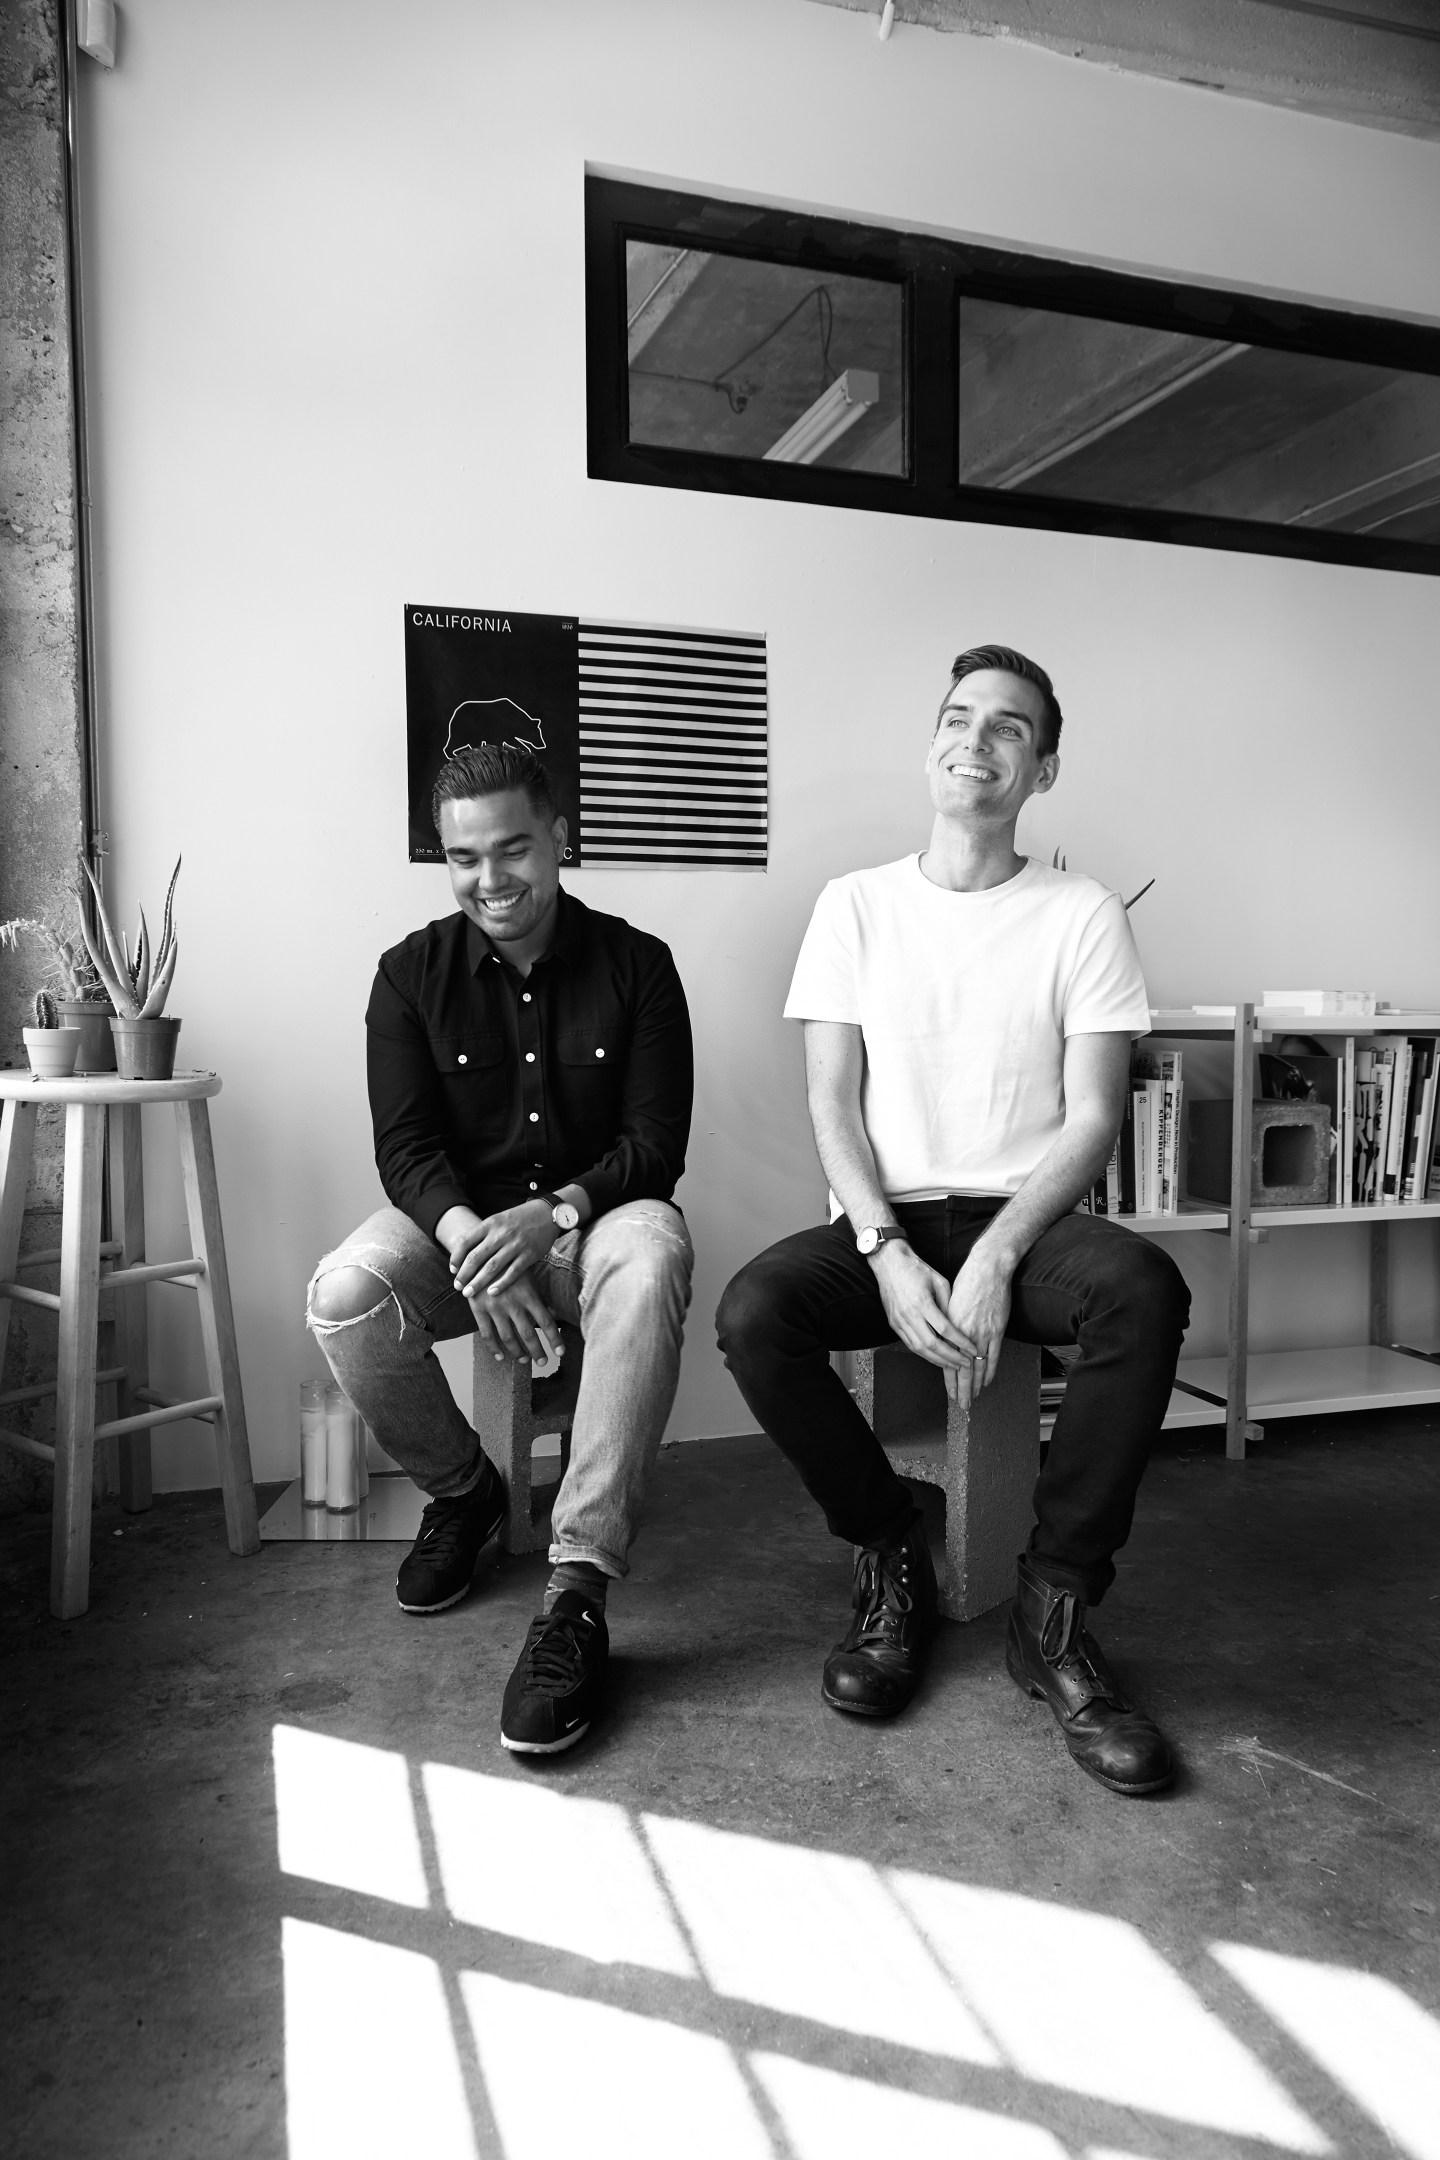 Meet The Graphic Designers Making Big Brands Look Sharp